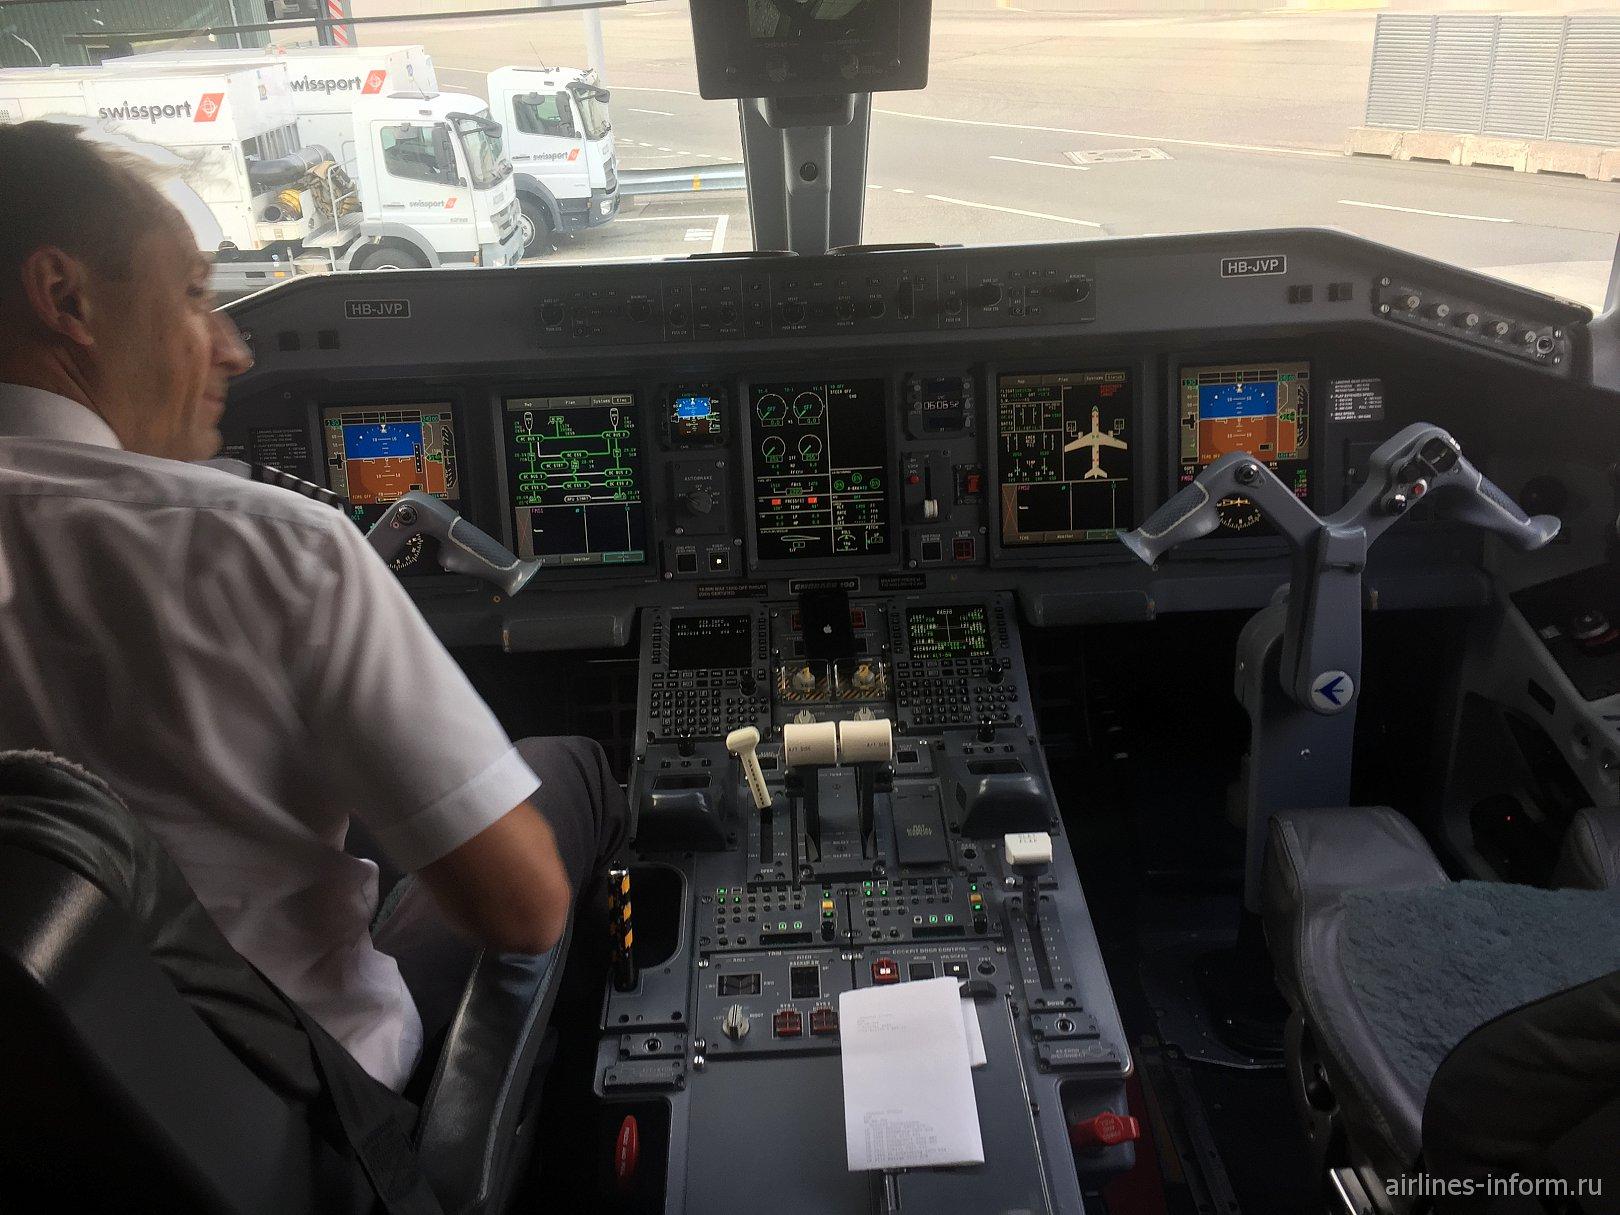 Пилотская кабина самолета Embraer 190 HB-JVP авиакомпании Helvetic Airways